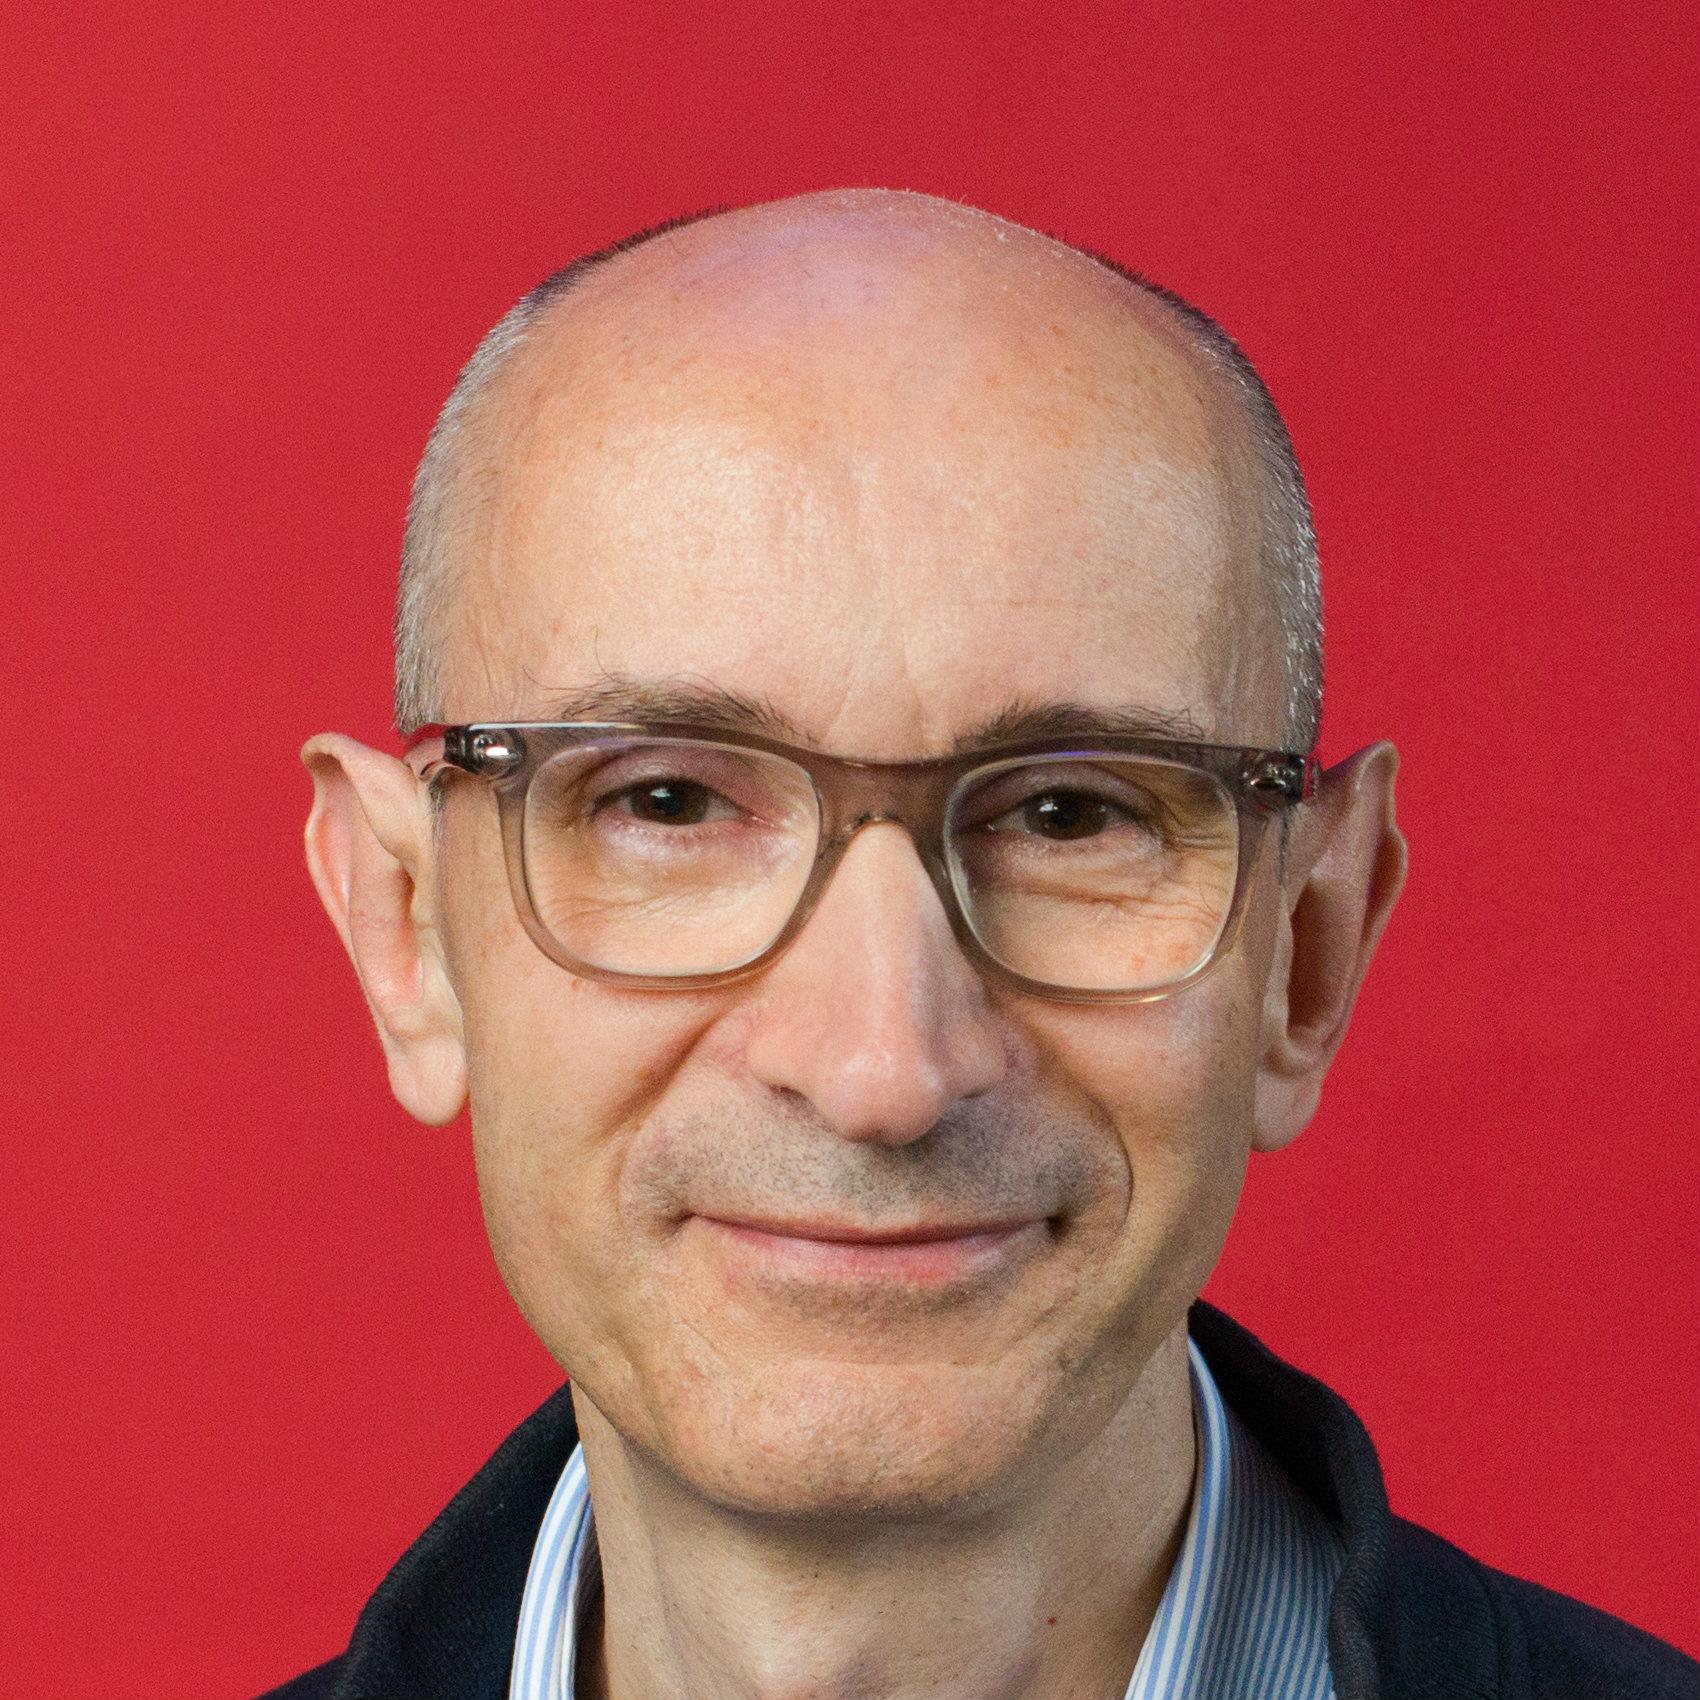 Paolo amoroso tc2017 headshot 1700x1700